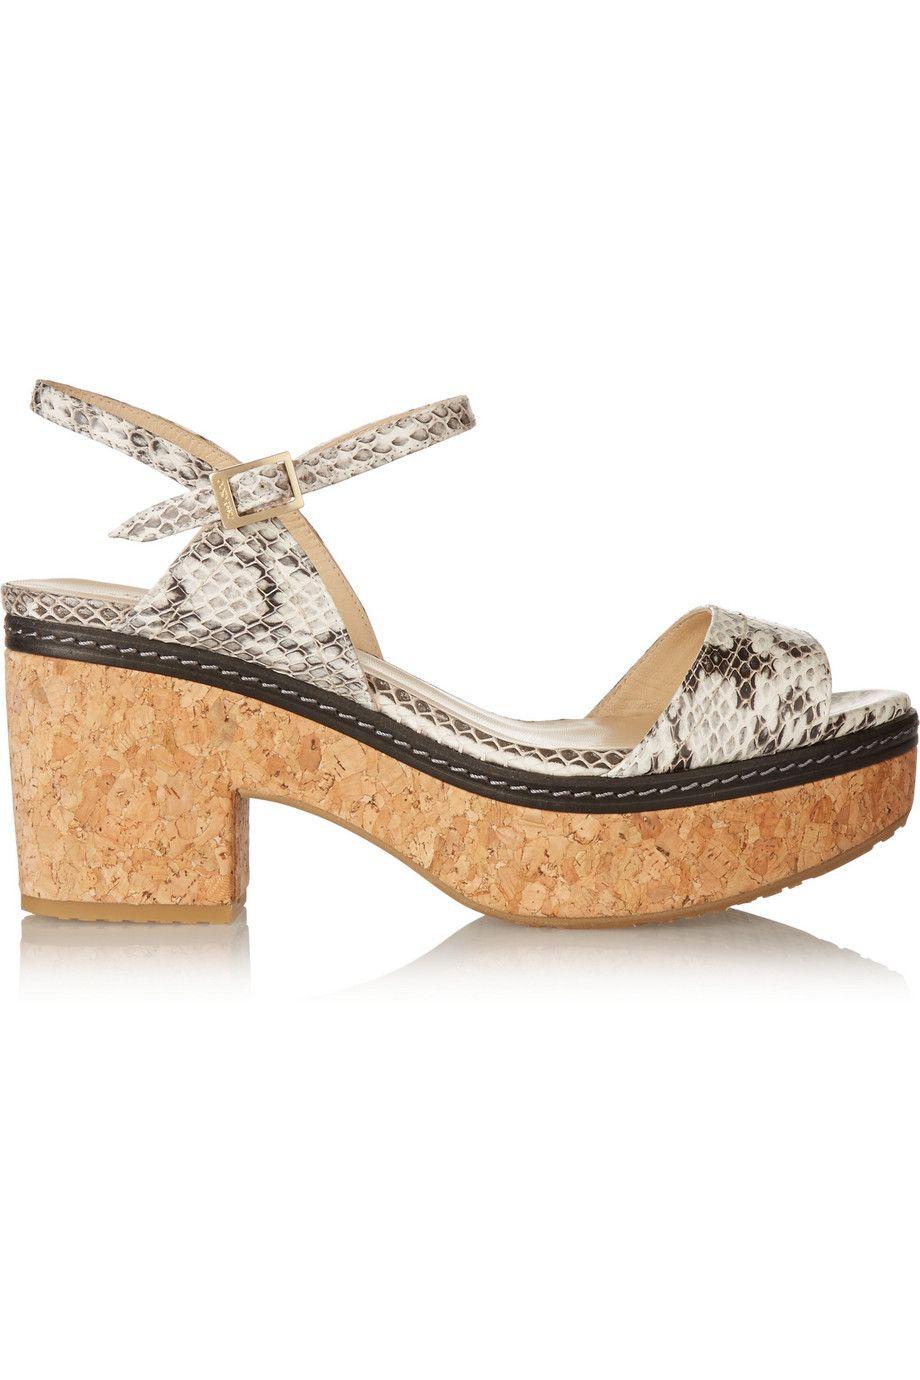 92c9de729430 JIMMY CHOO Naylor Elaphe And Leather Platform Sandals.  jimmychoo  shoes   sandals